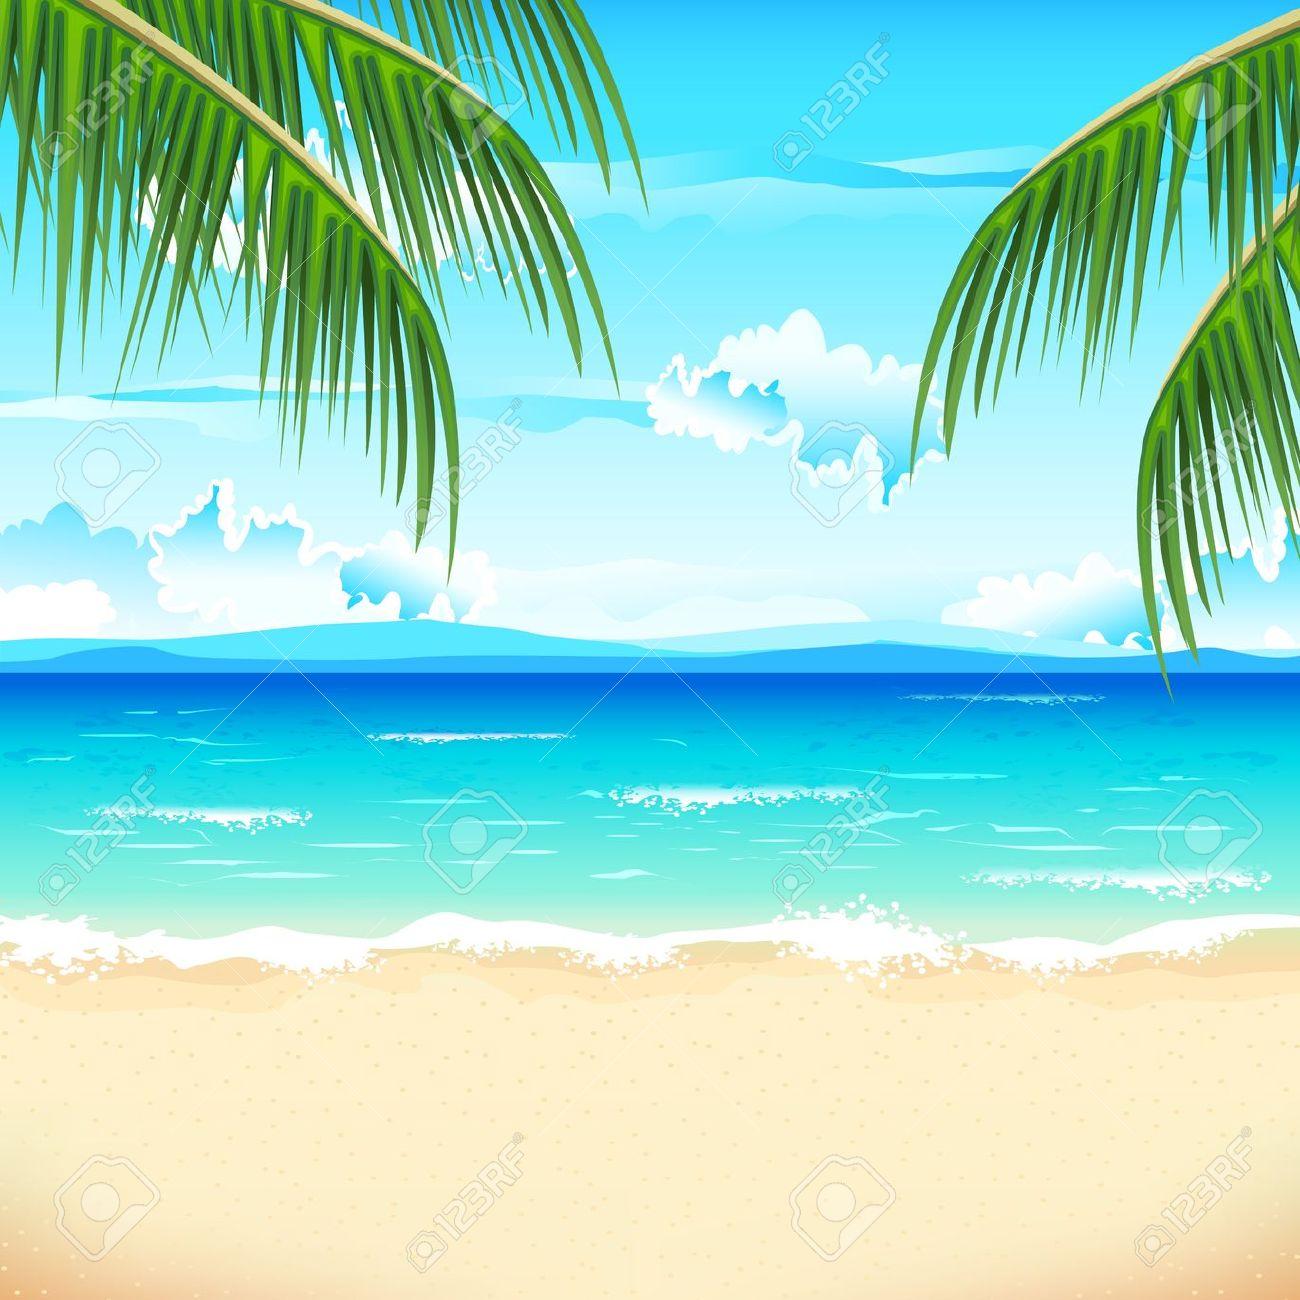 Beautiful beach scenery clipart.